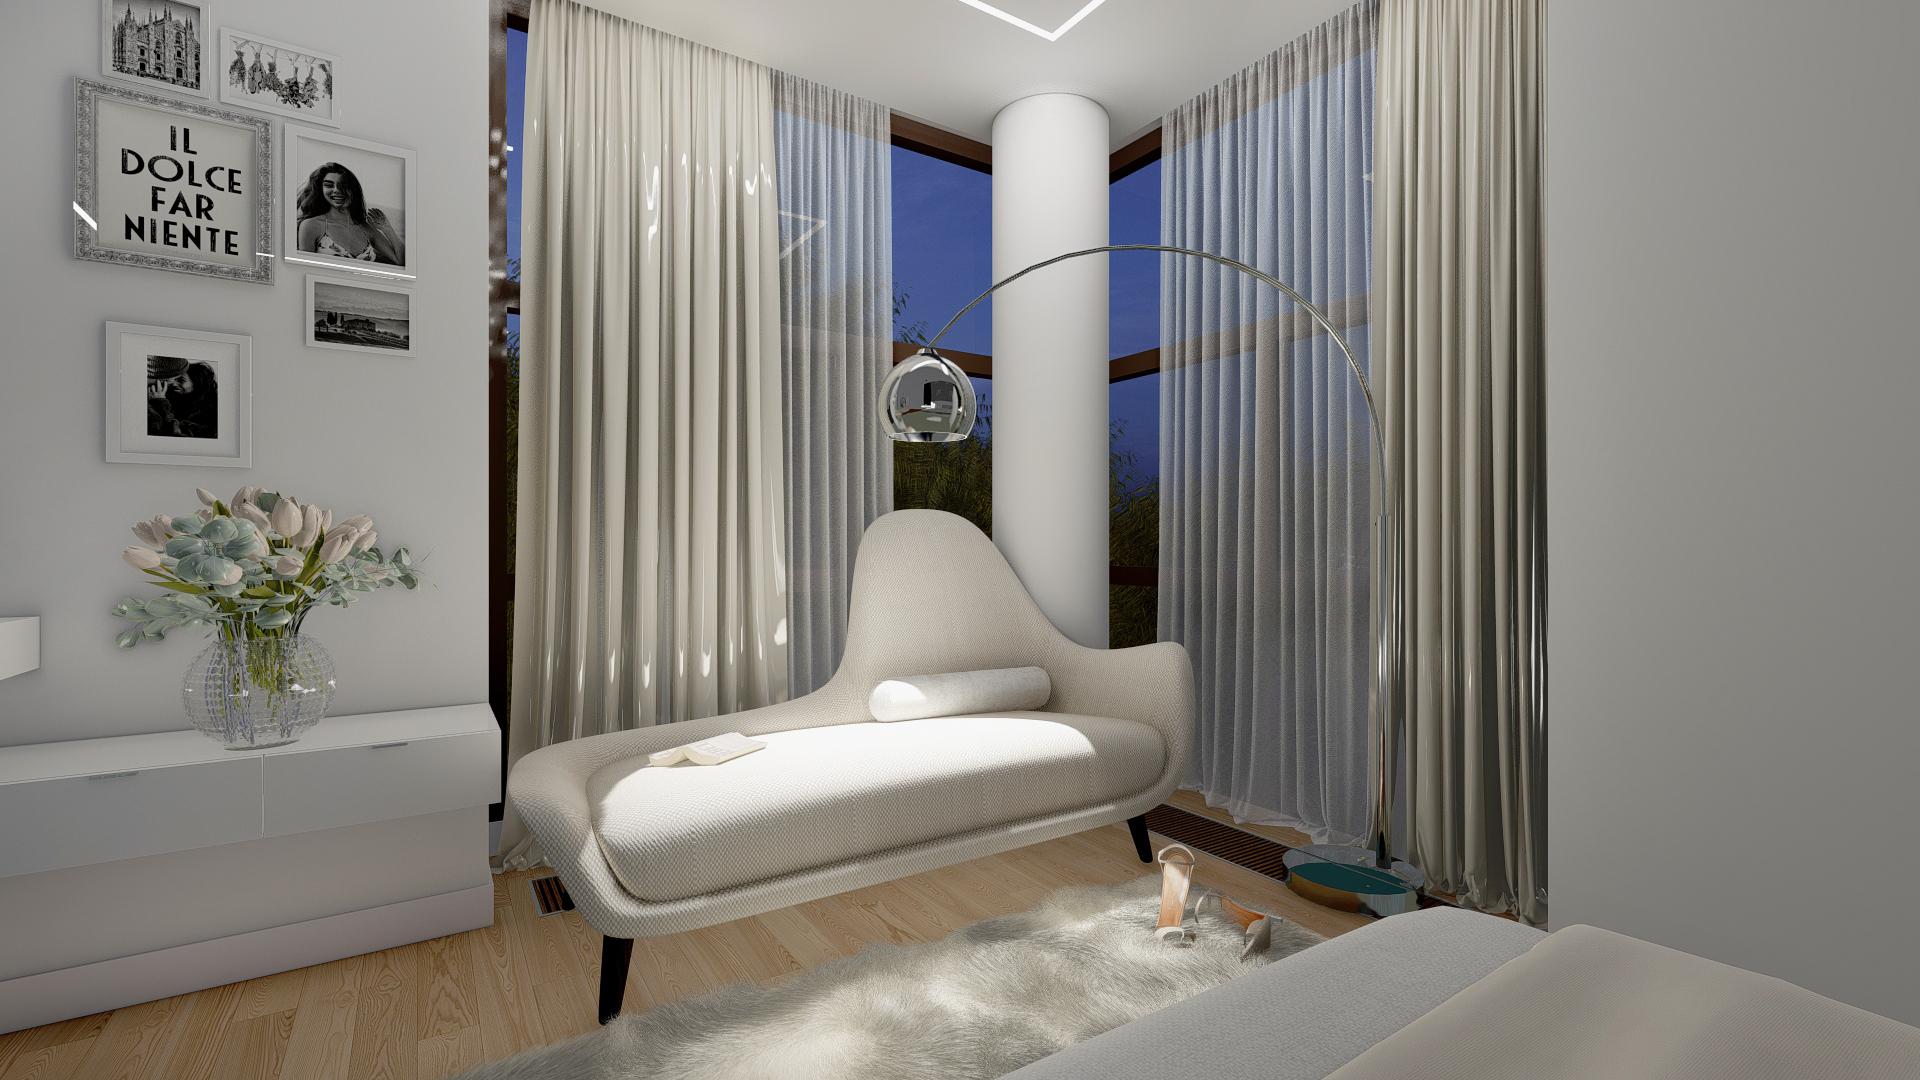 etaj-dormitor-master-v2_5—Photo_12—Photo_12—Photo